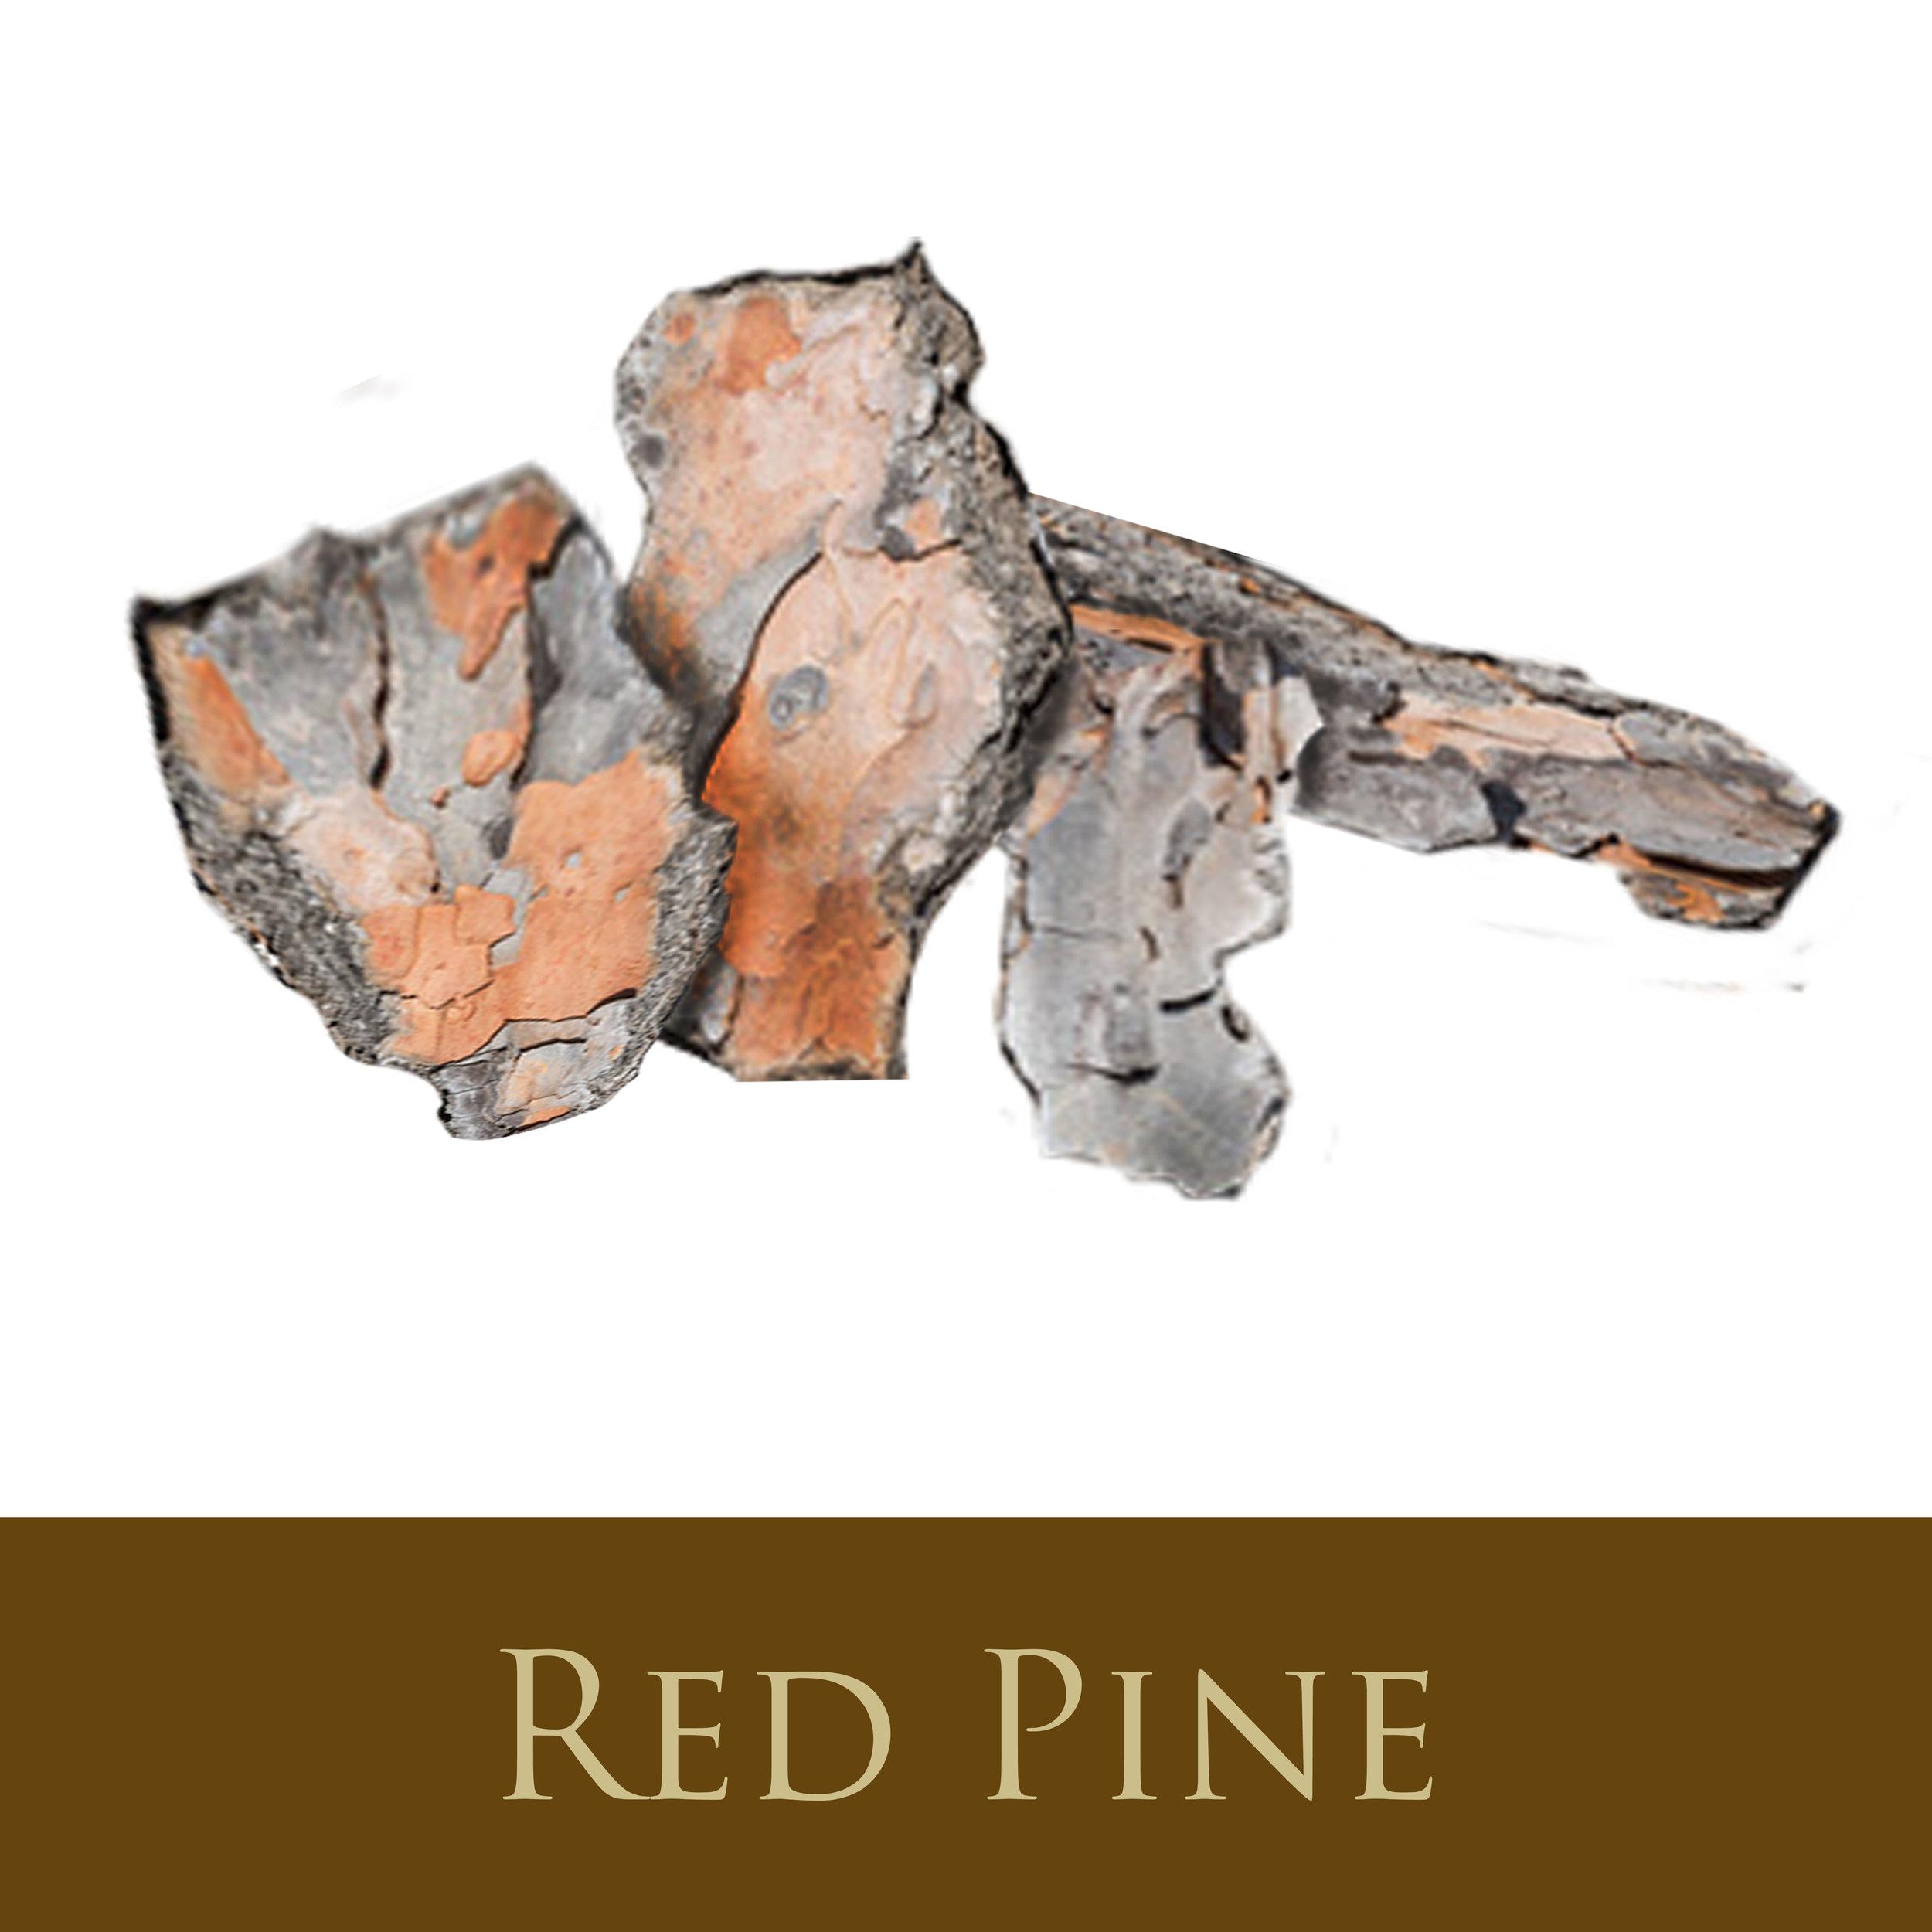 Res Pine.jpg